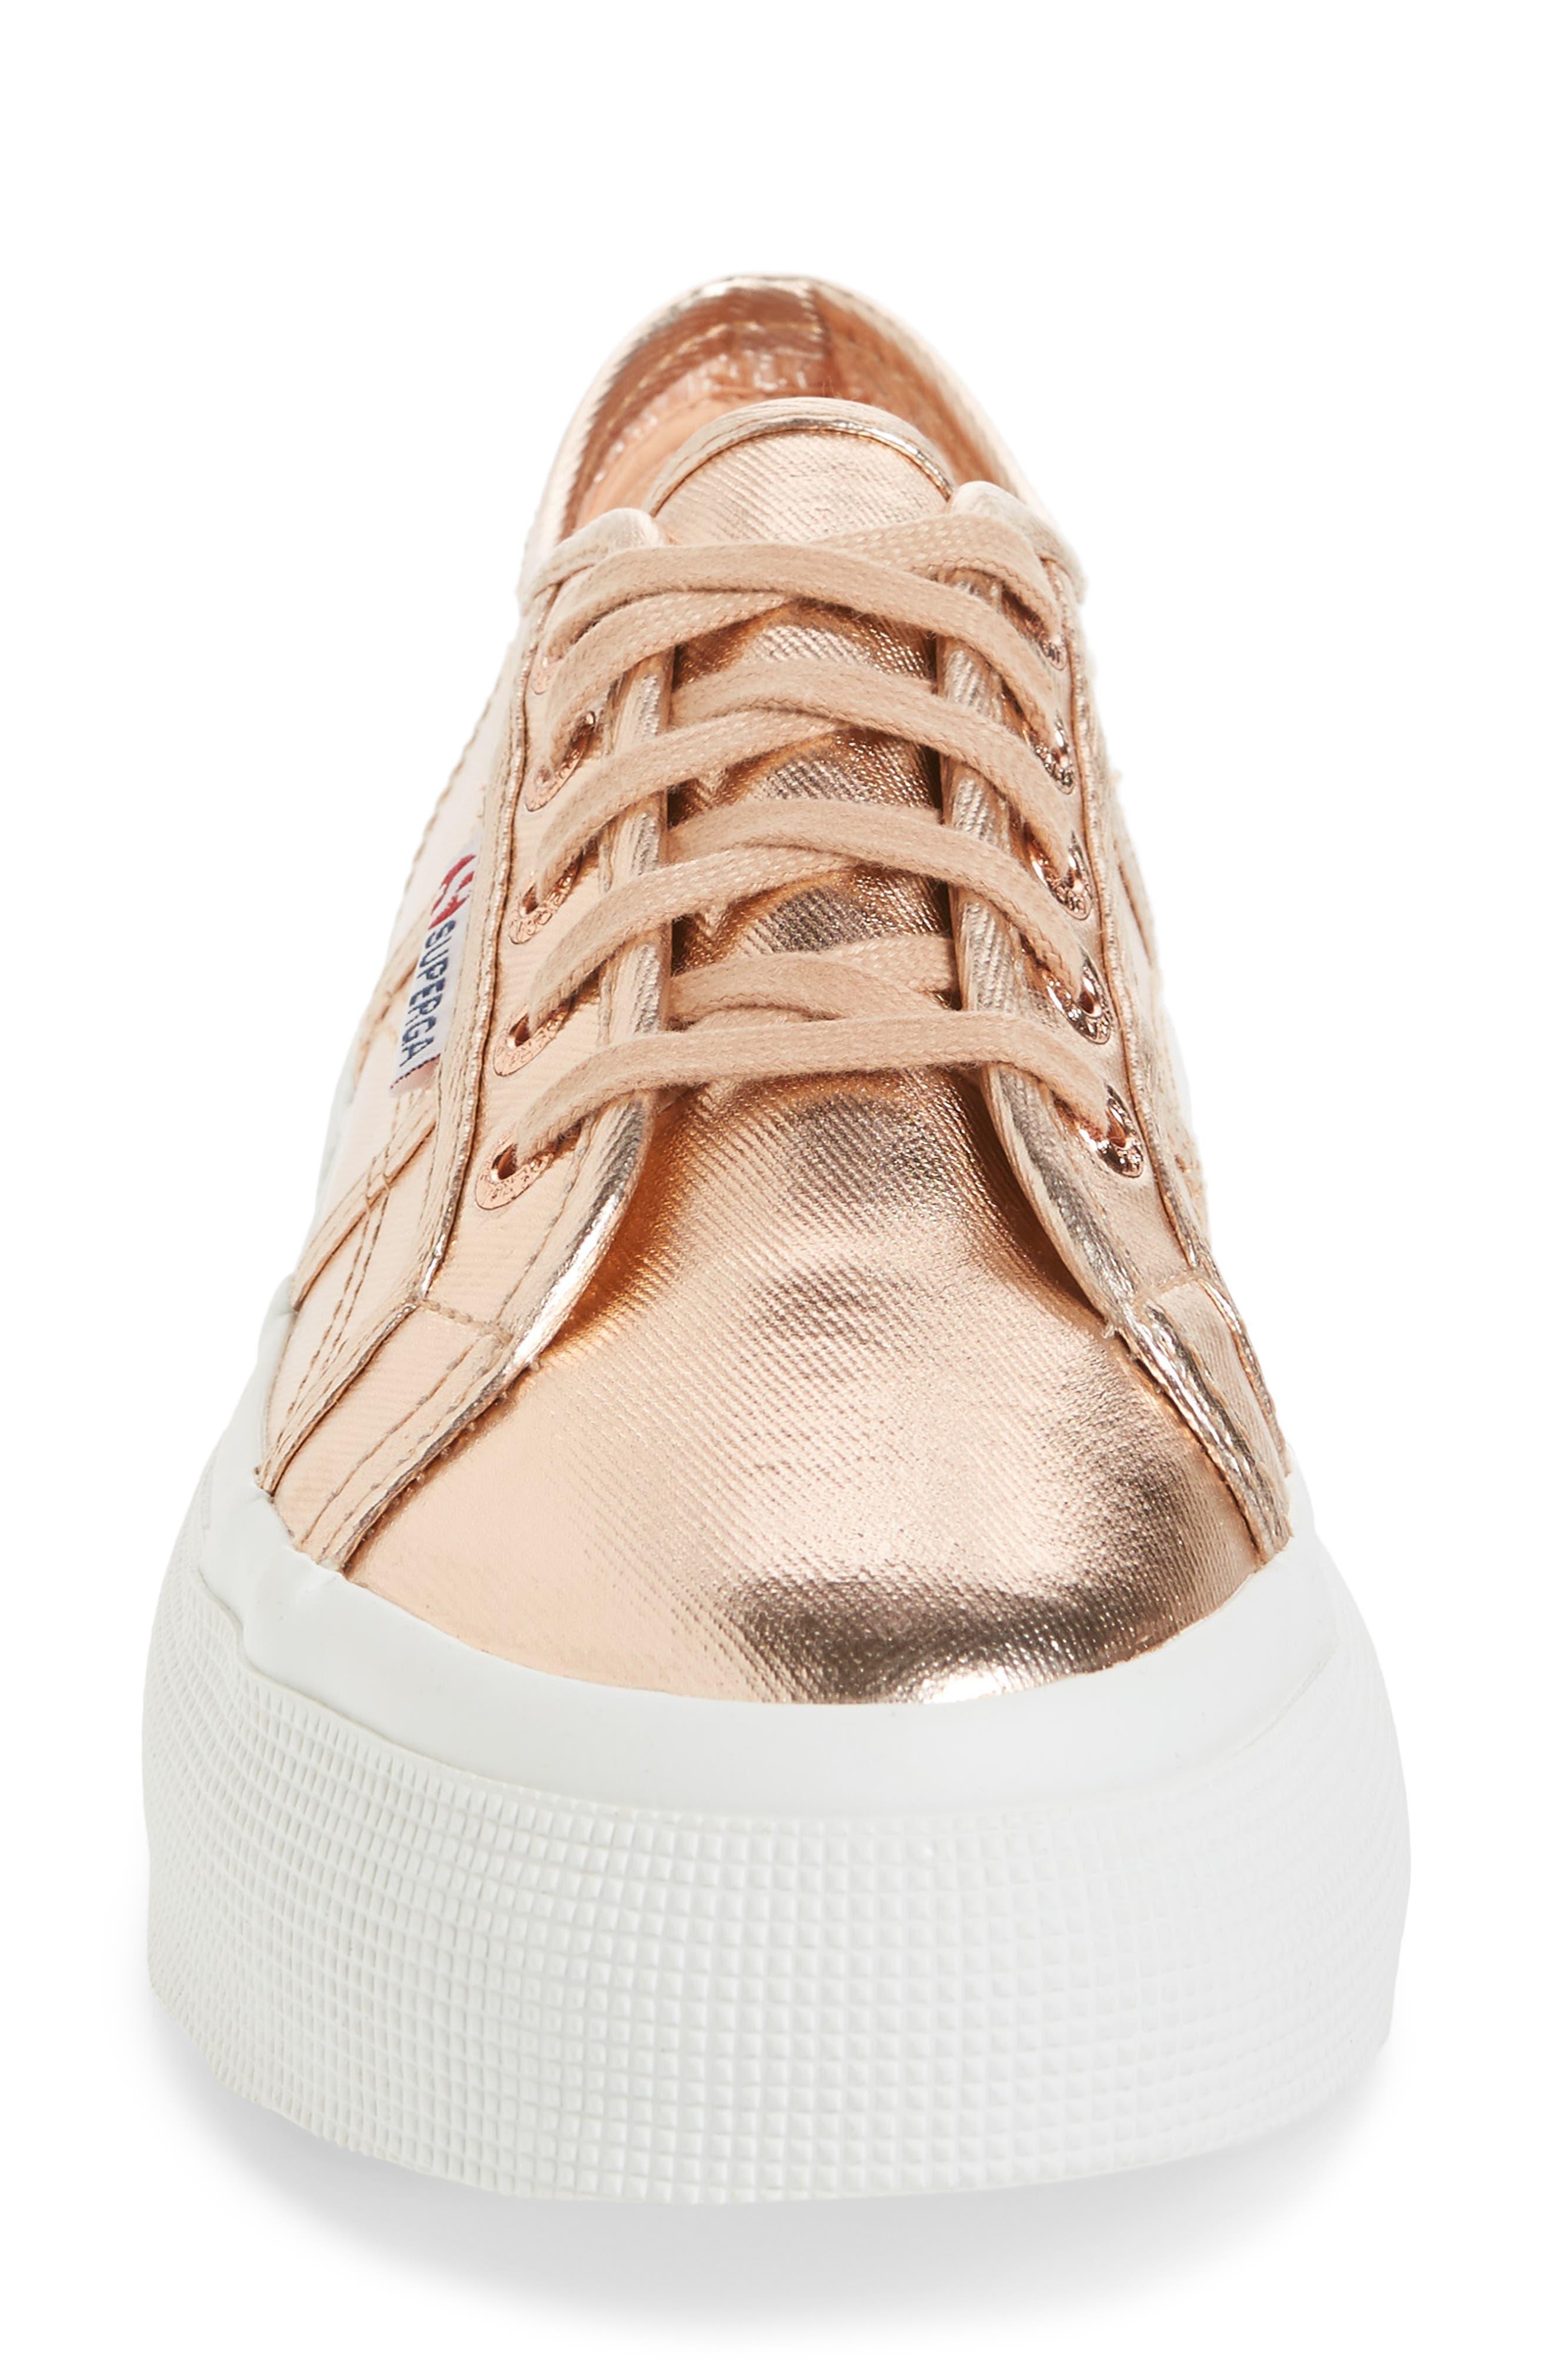 2287 Cotu Platform Sneaker,                             Alternate thumbnail 8, color,